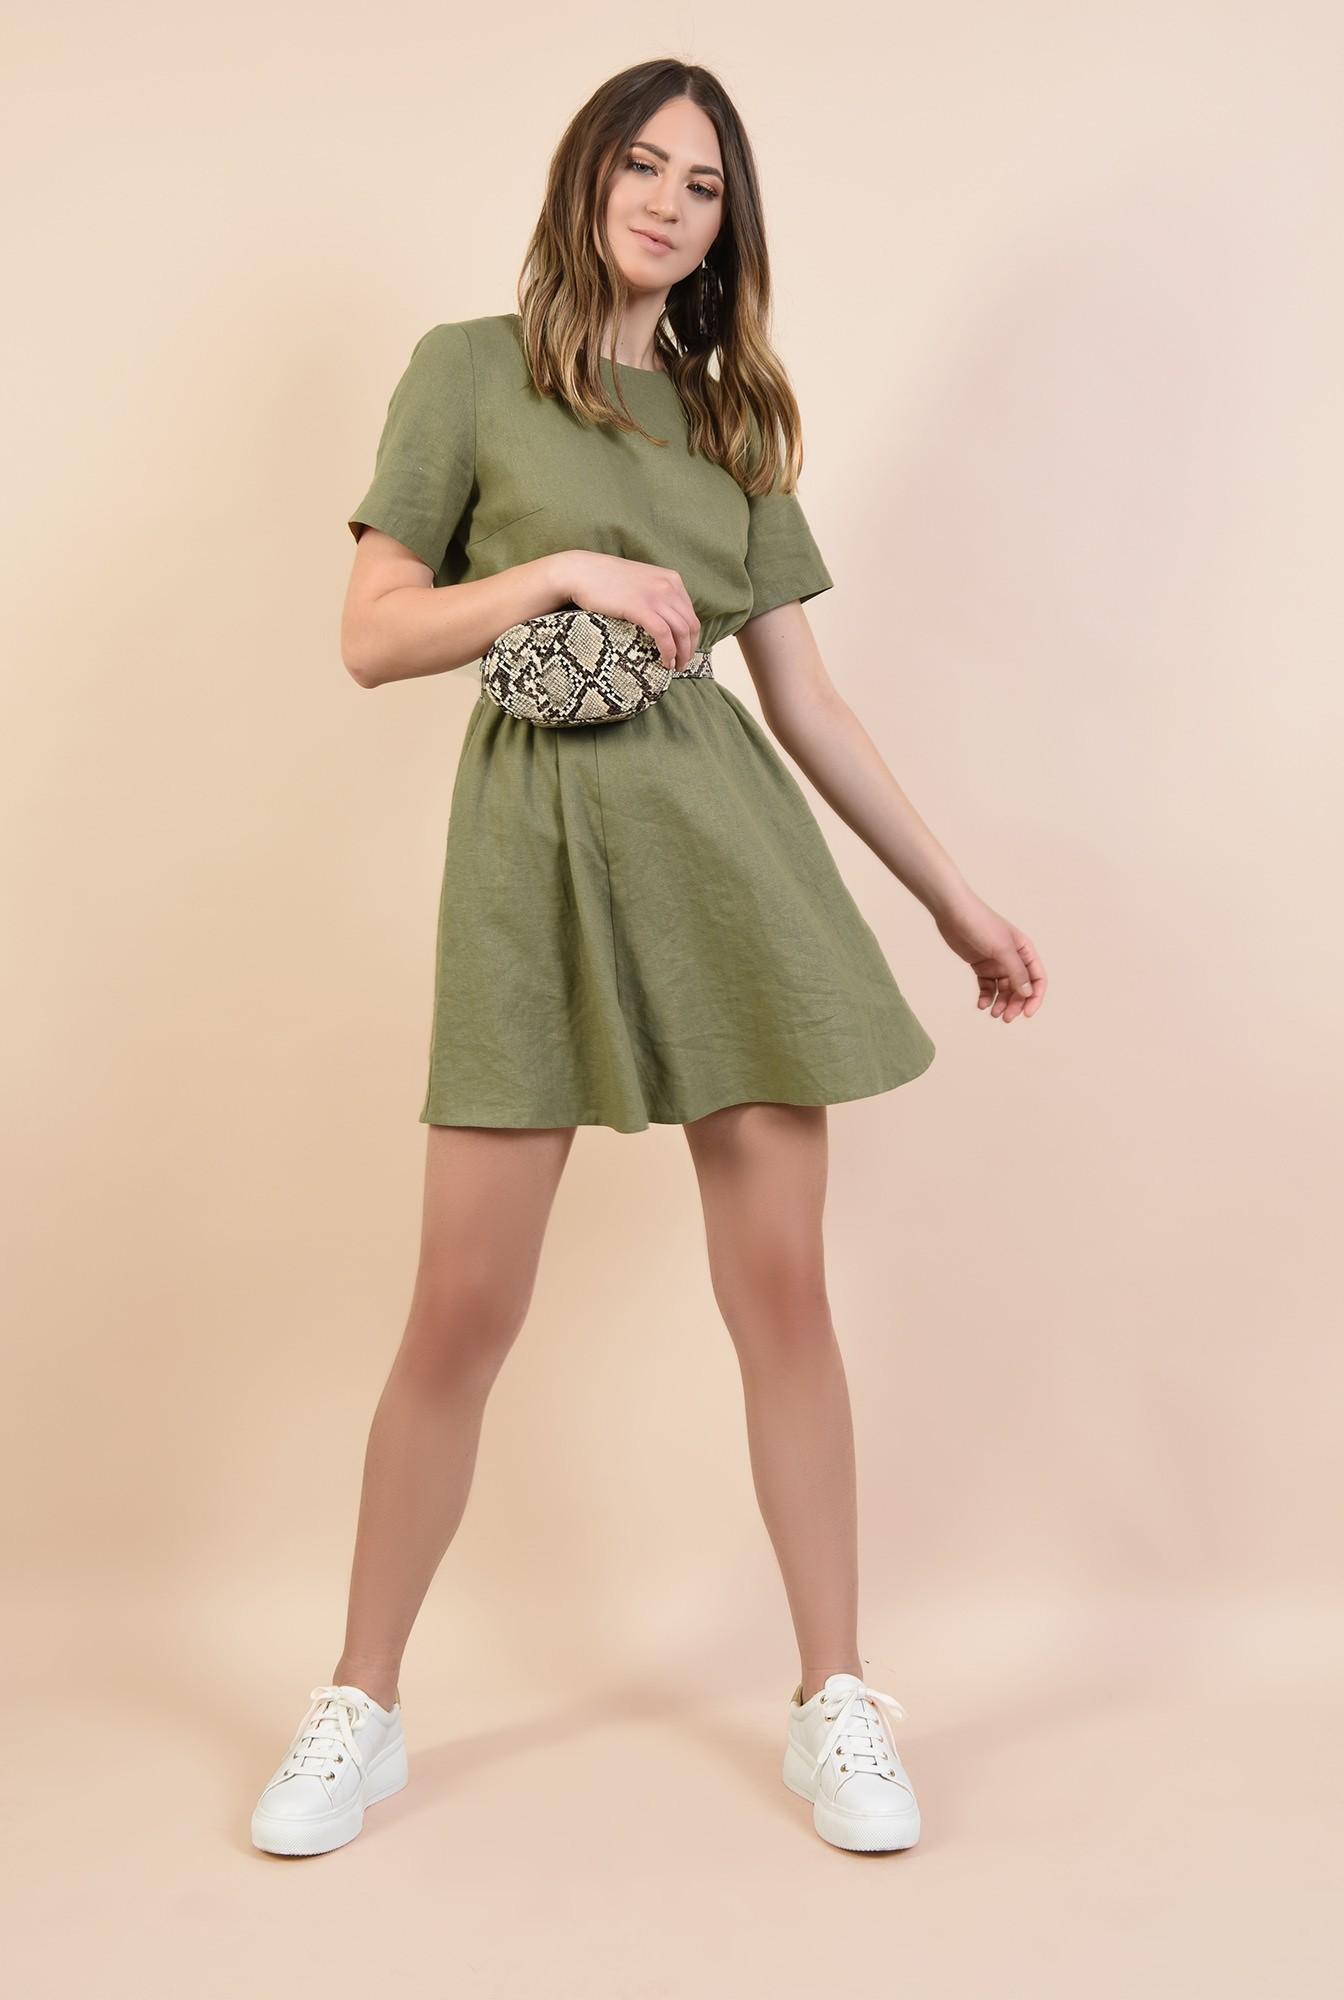 3 - 360 - rochie scurta, croi pe bie, decolteu rotund la baza gatului